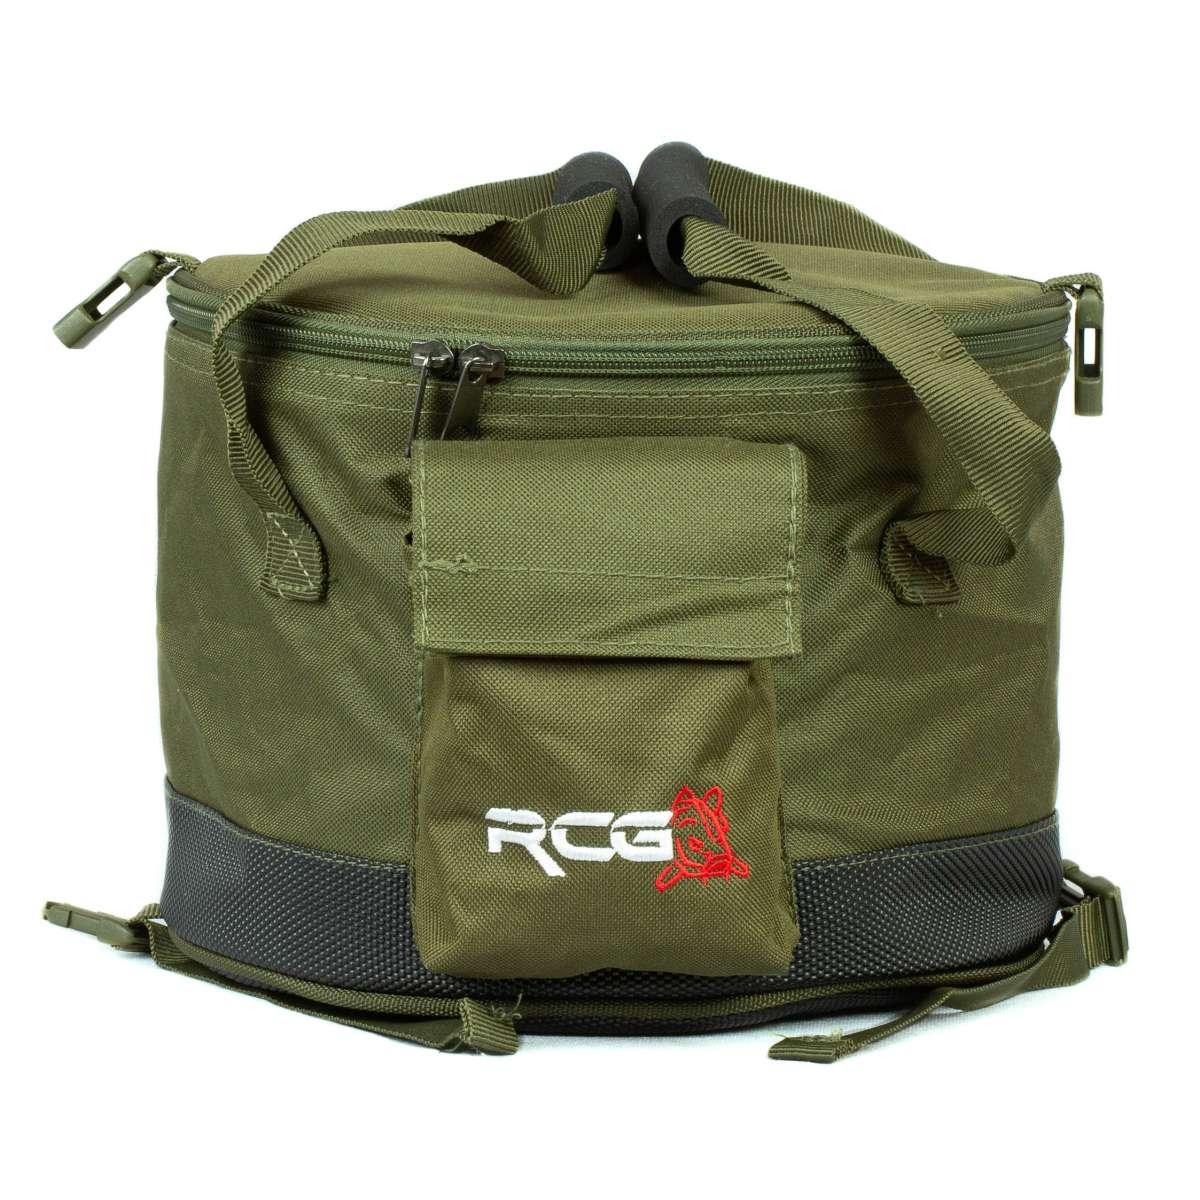 RCG Boillie Bag